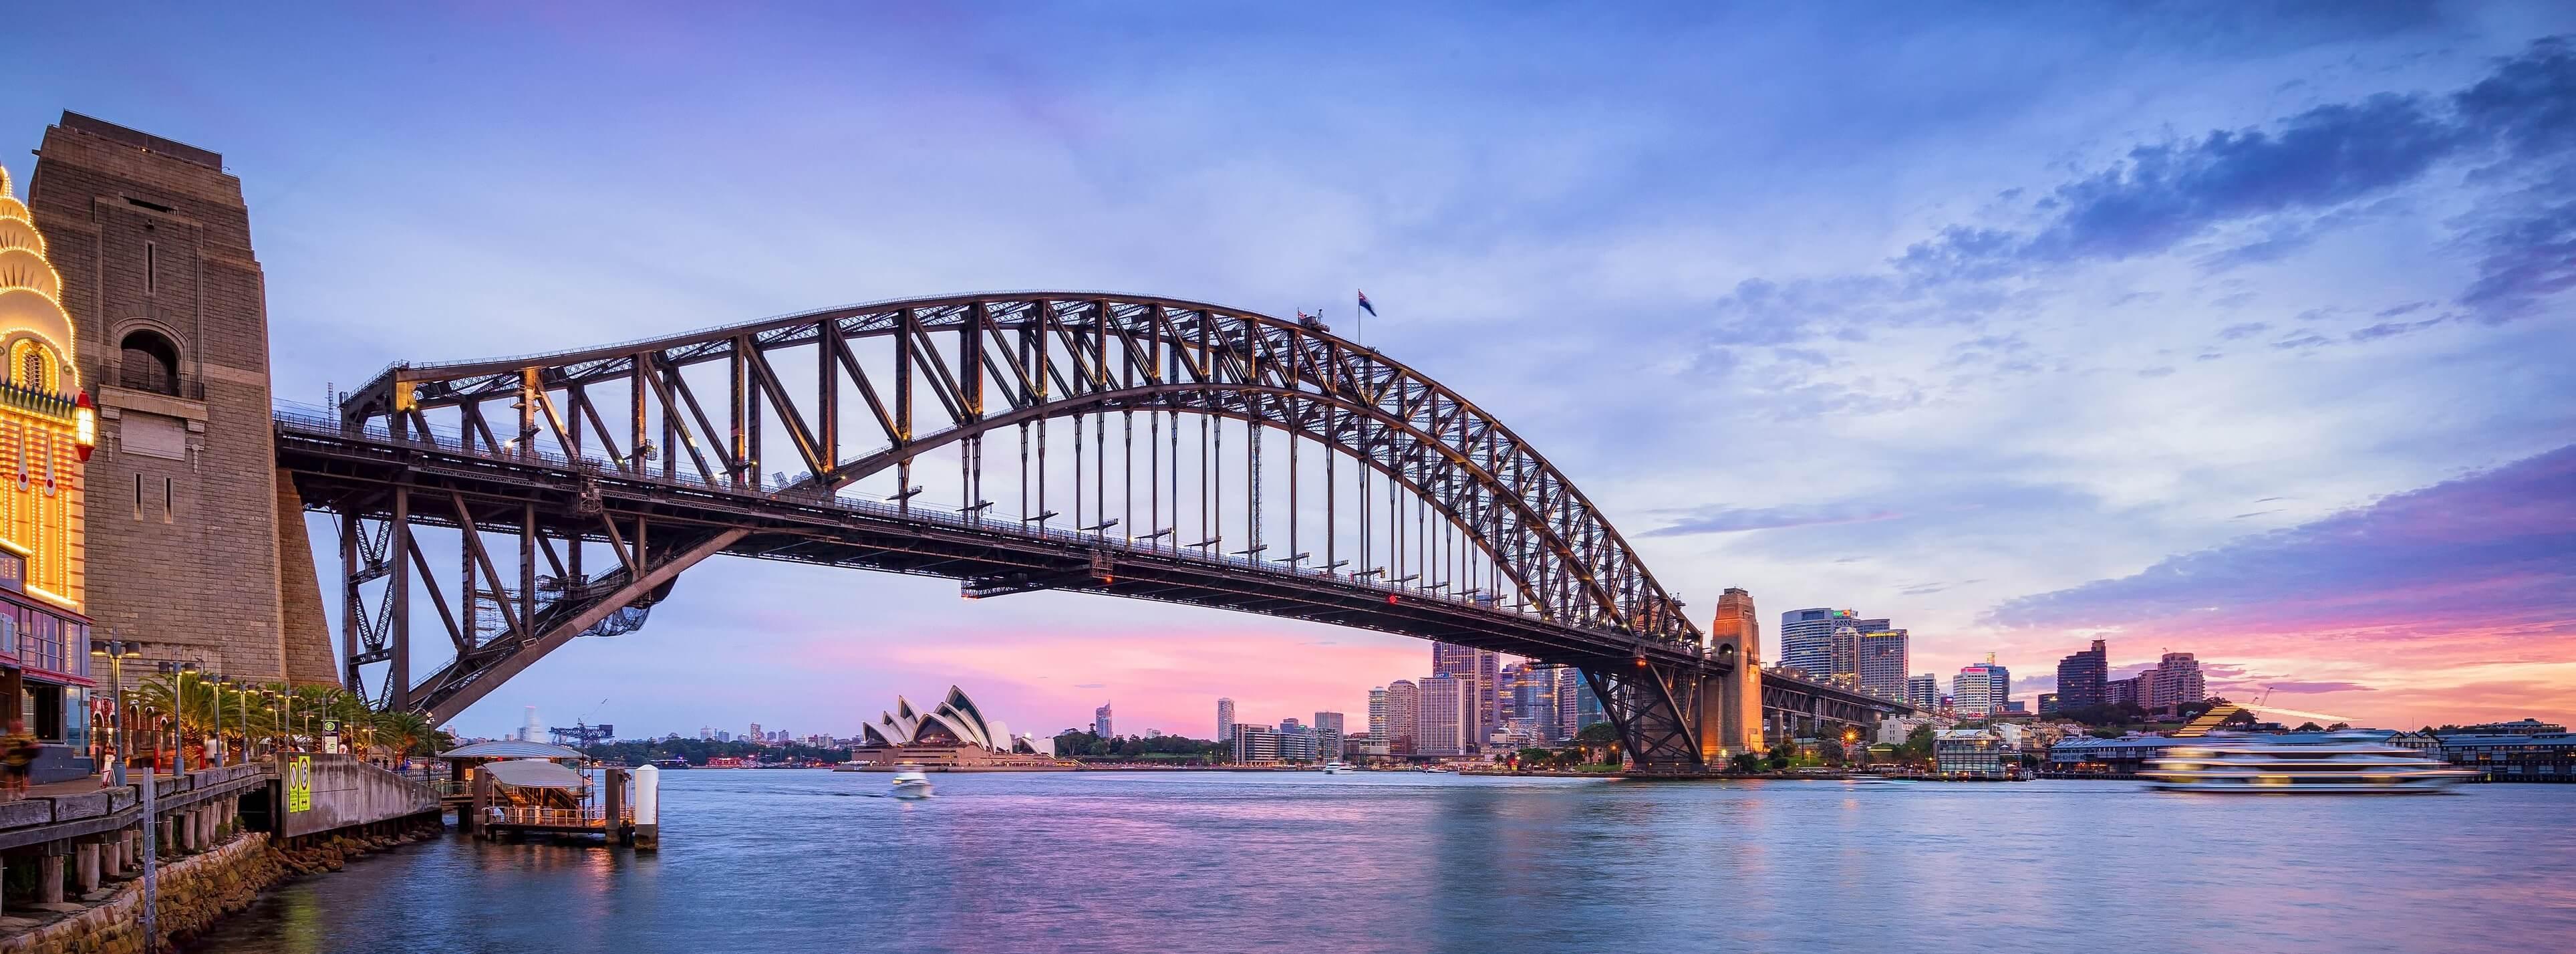 How old is the Sydney Harbour Bridge?